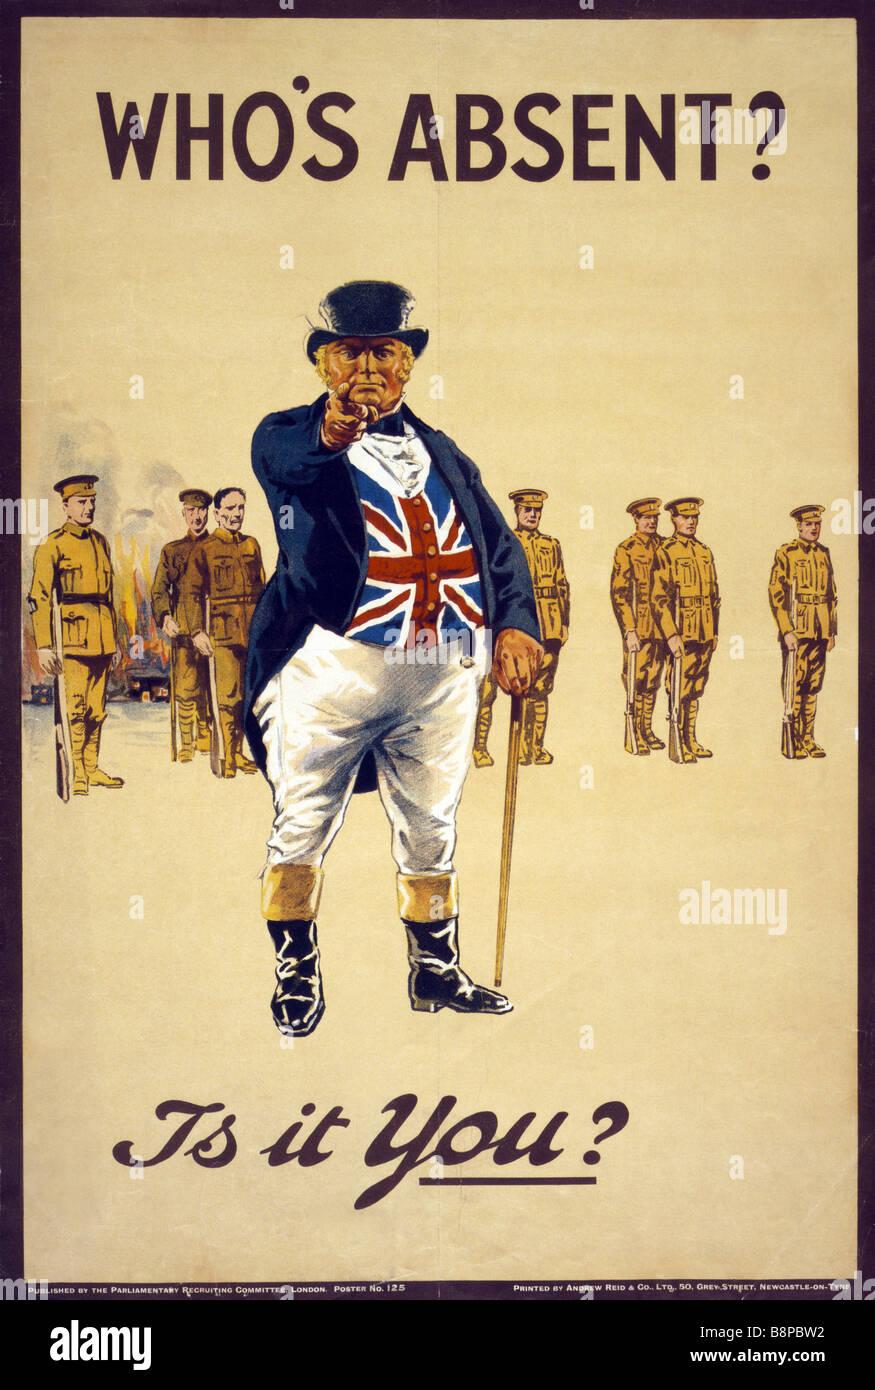 army world war ii and british - us army rations - world war ii   us army handbook 1939-1945, george forty, alan sutton publishing, 1995, p 117.